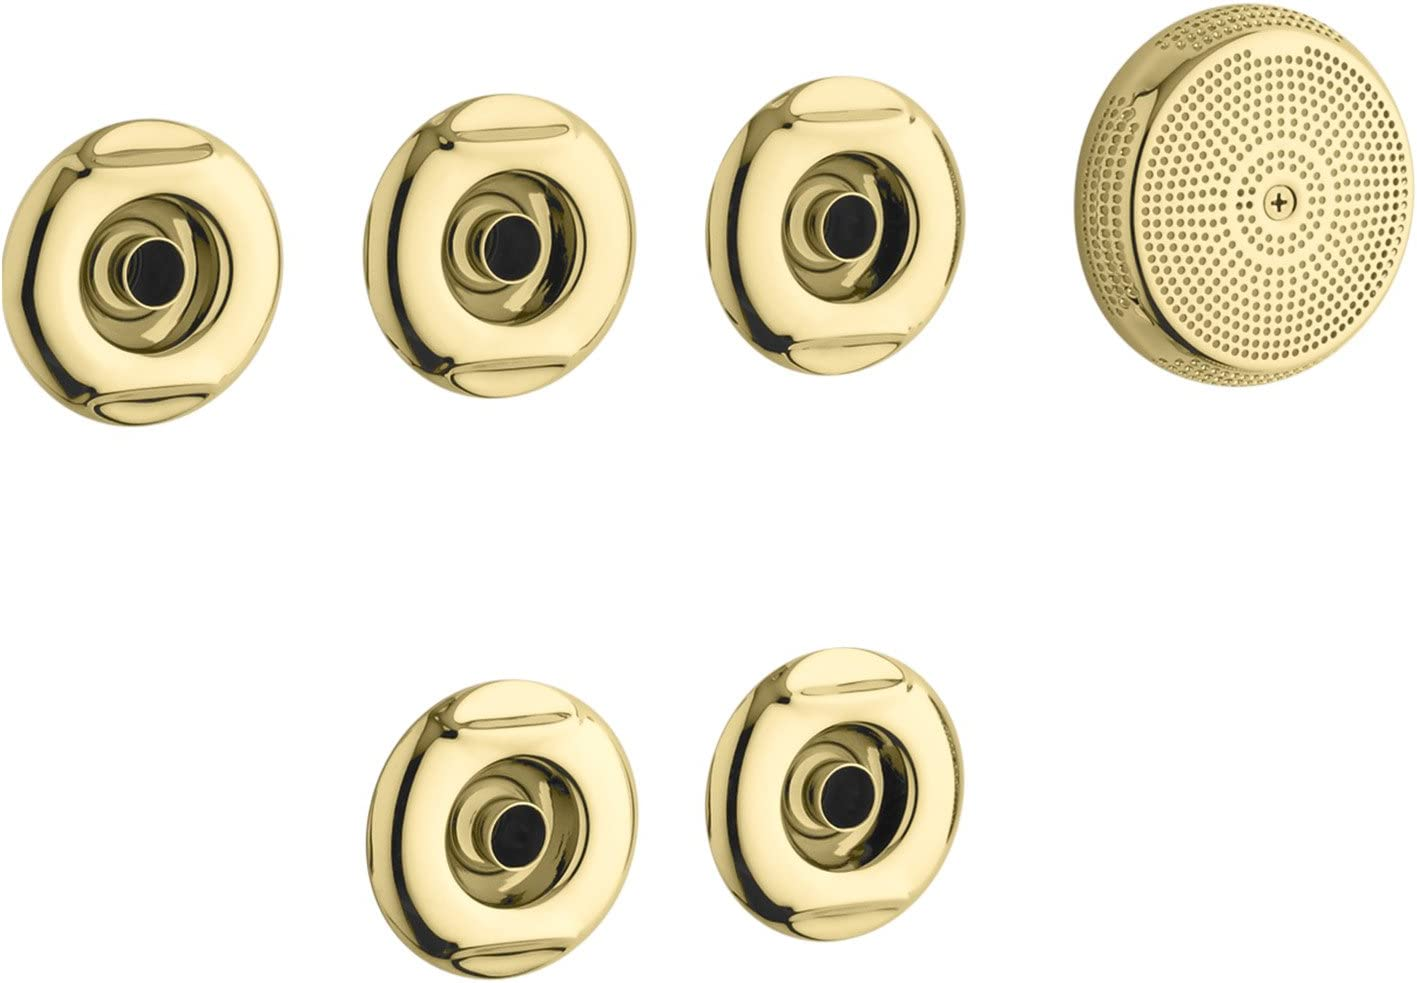 KOHLER K-9695-PB Flexjet Whirlpool Trim Kit, Vibrant Polished Brass